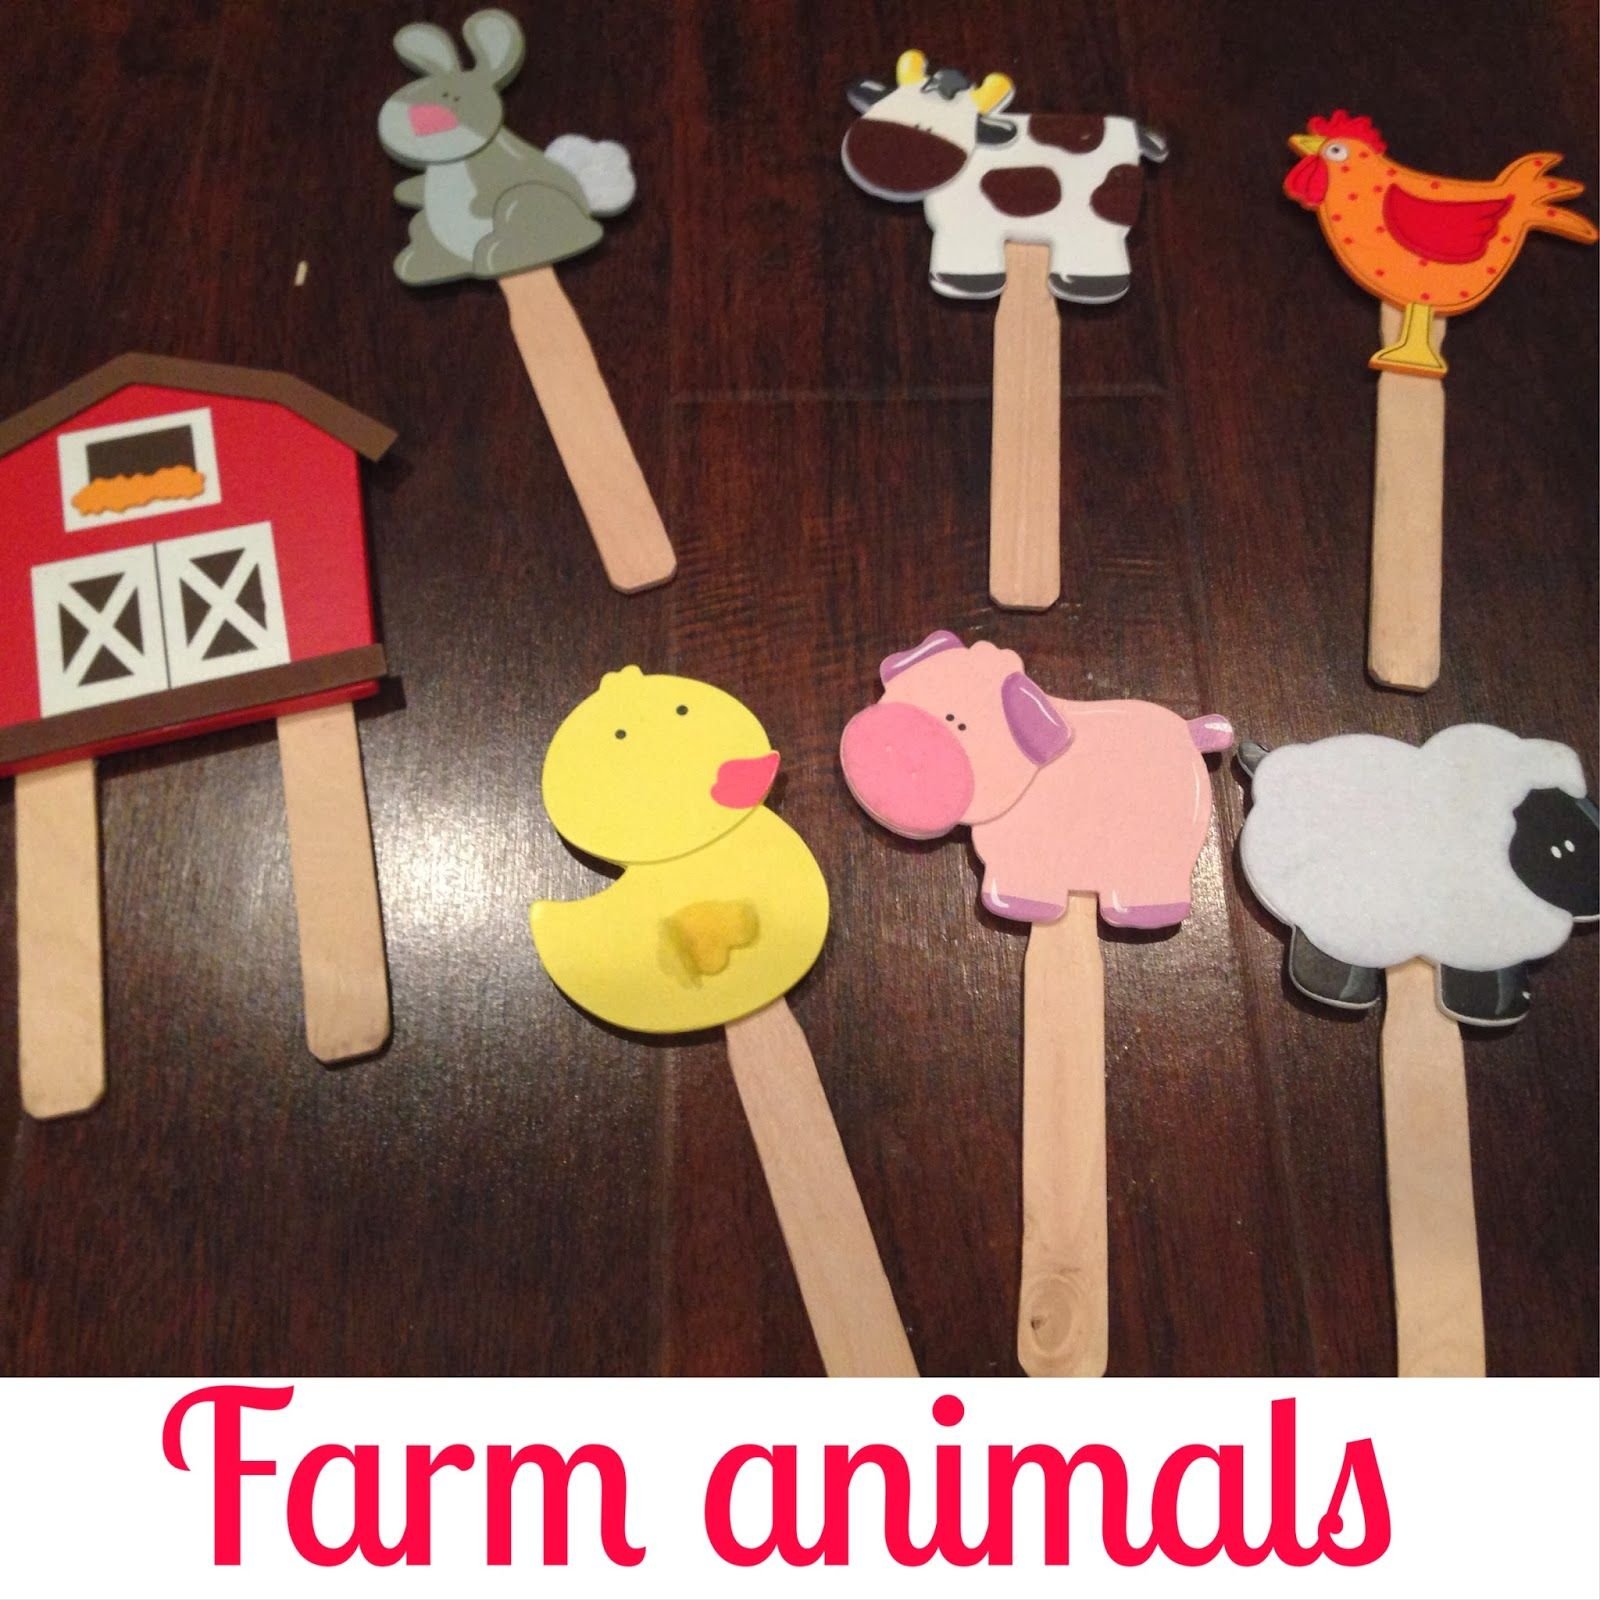 Farm Animal Craft Sticks 5 For Supplies 5 Minutes To Make Keeps